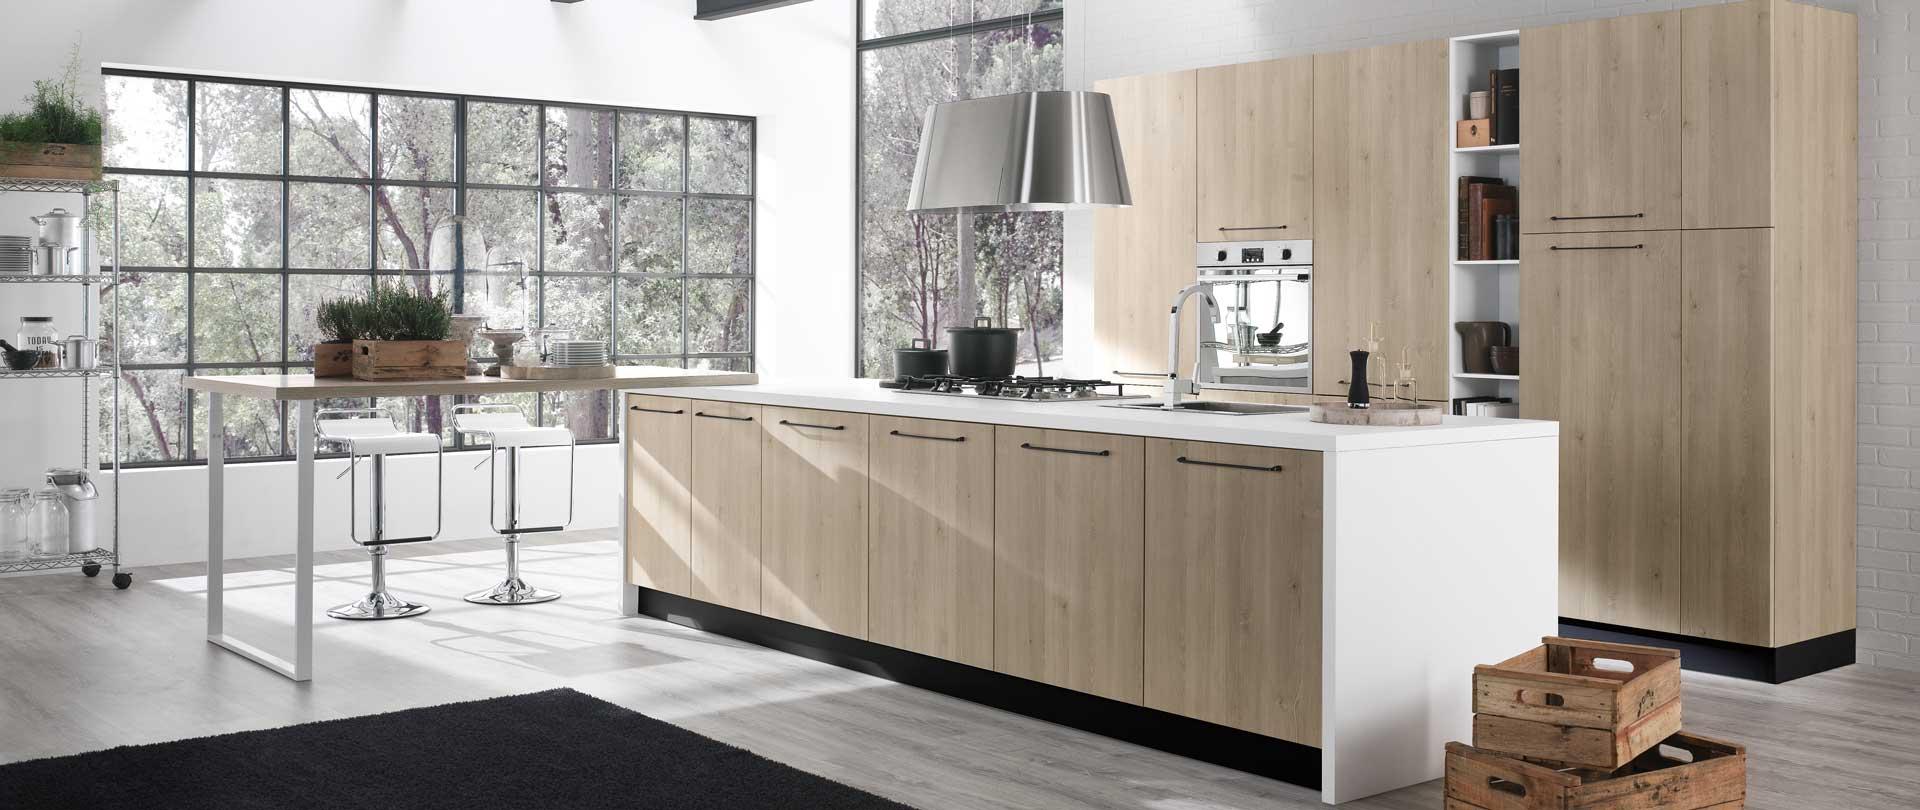 01-evo-cucina-aurora_rovere-beige